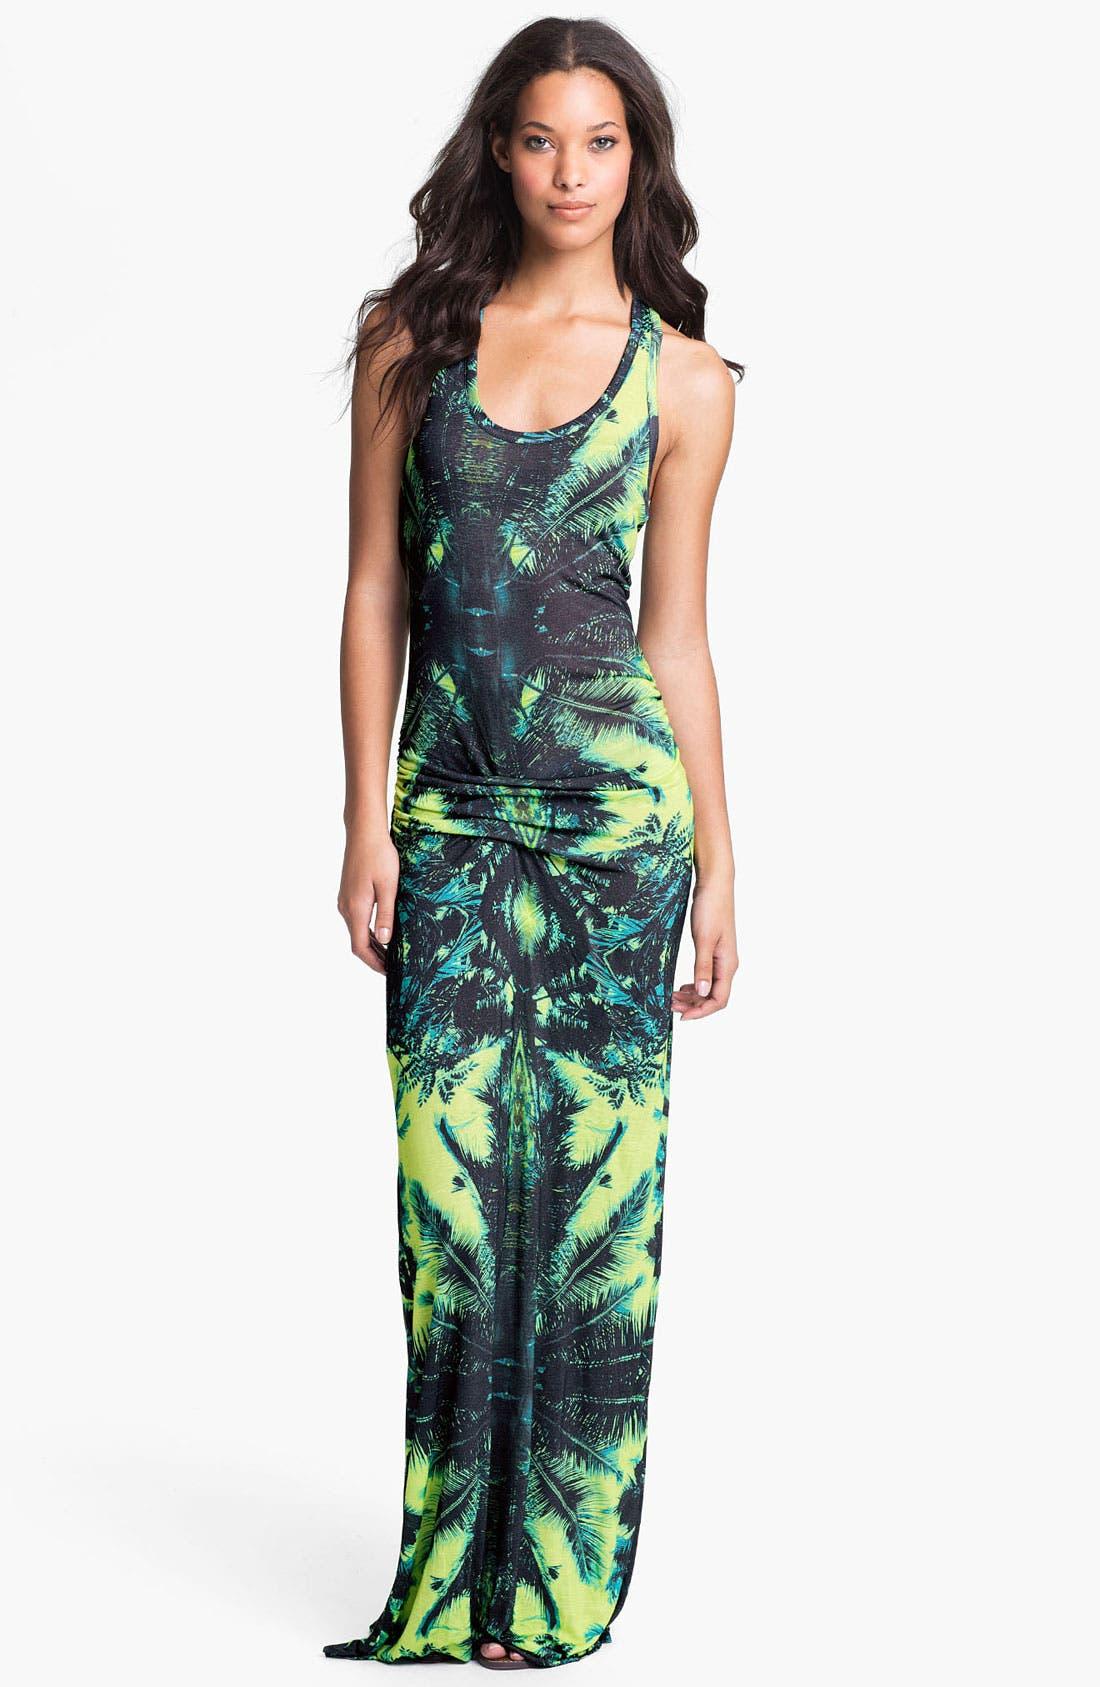 Main Image - Young, Fabulous & Broke 'Hamptons' Print Racerback Maxi Dress